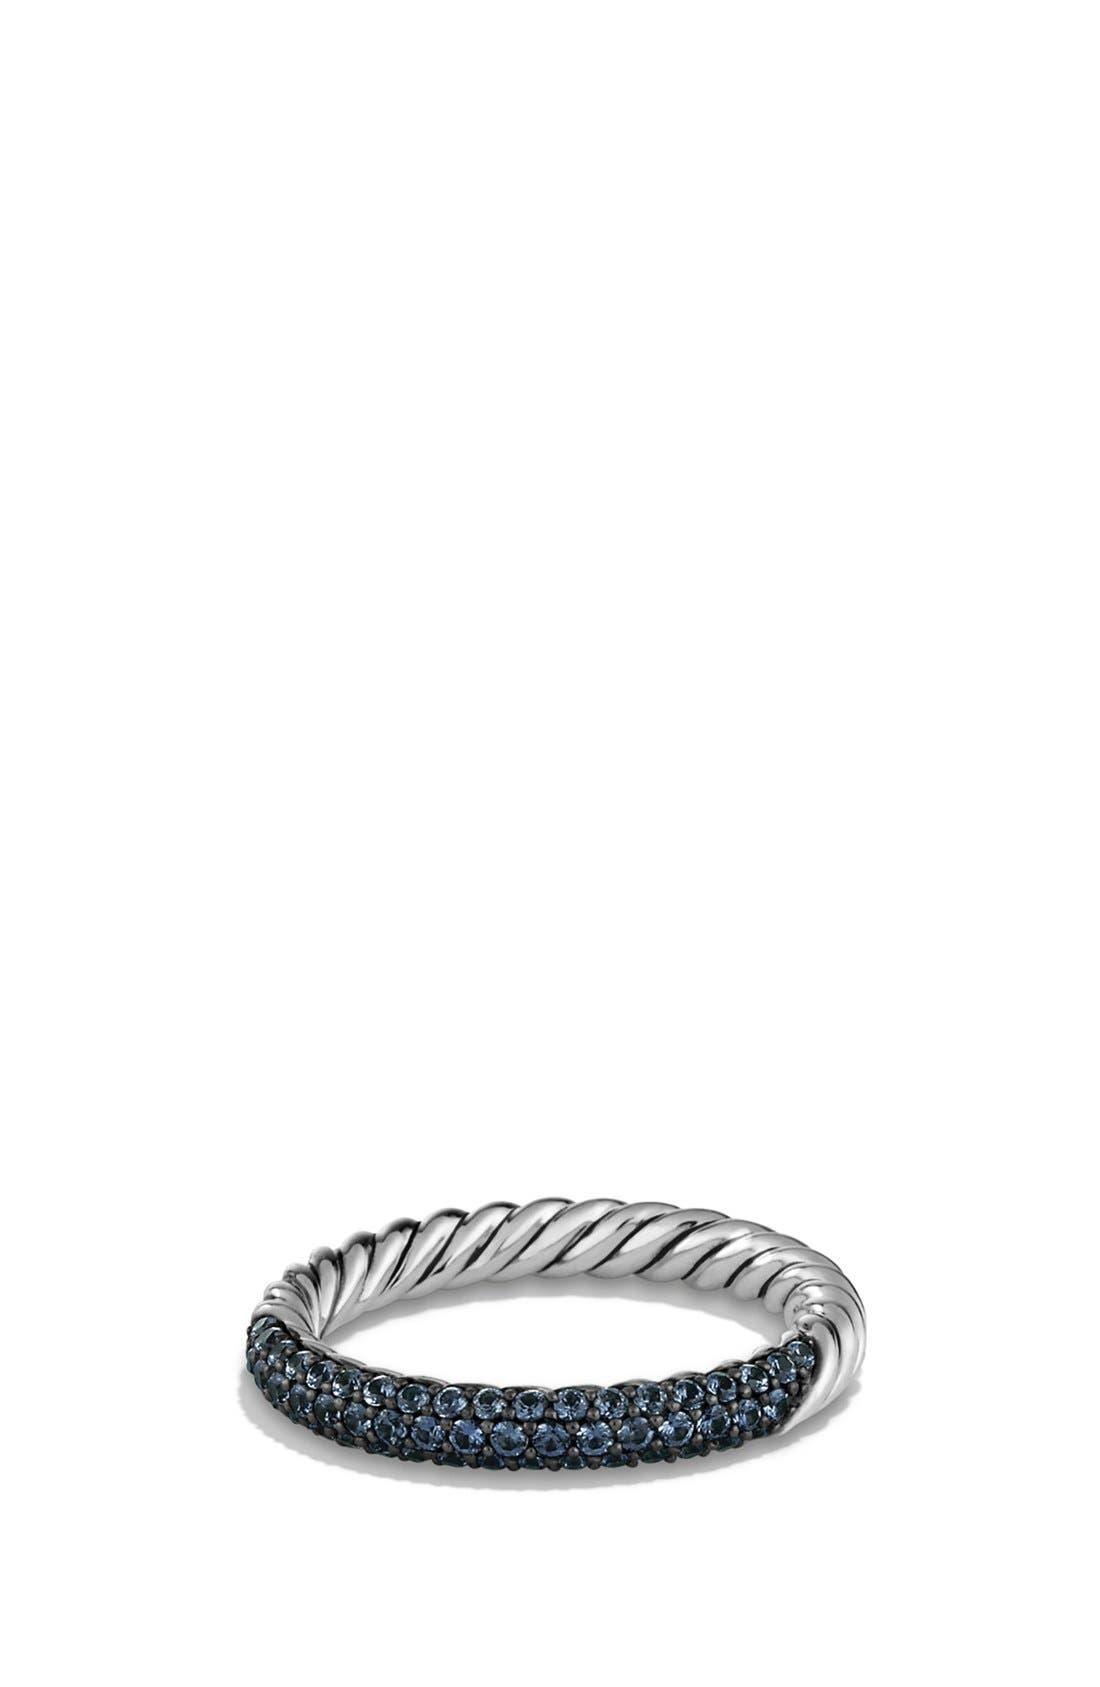 'Petite Pavé' Ring with Sapphires,                         Main,                         color, BLUE SAPHIRE